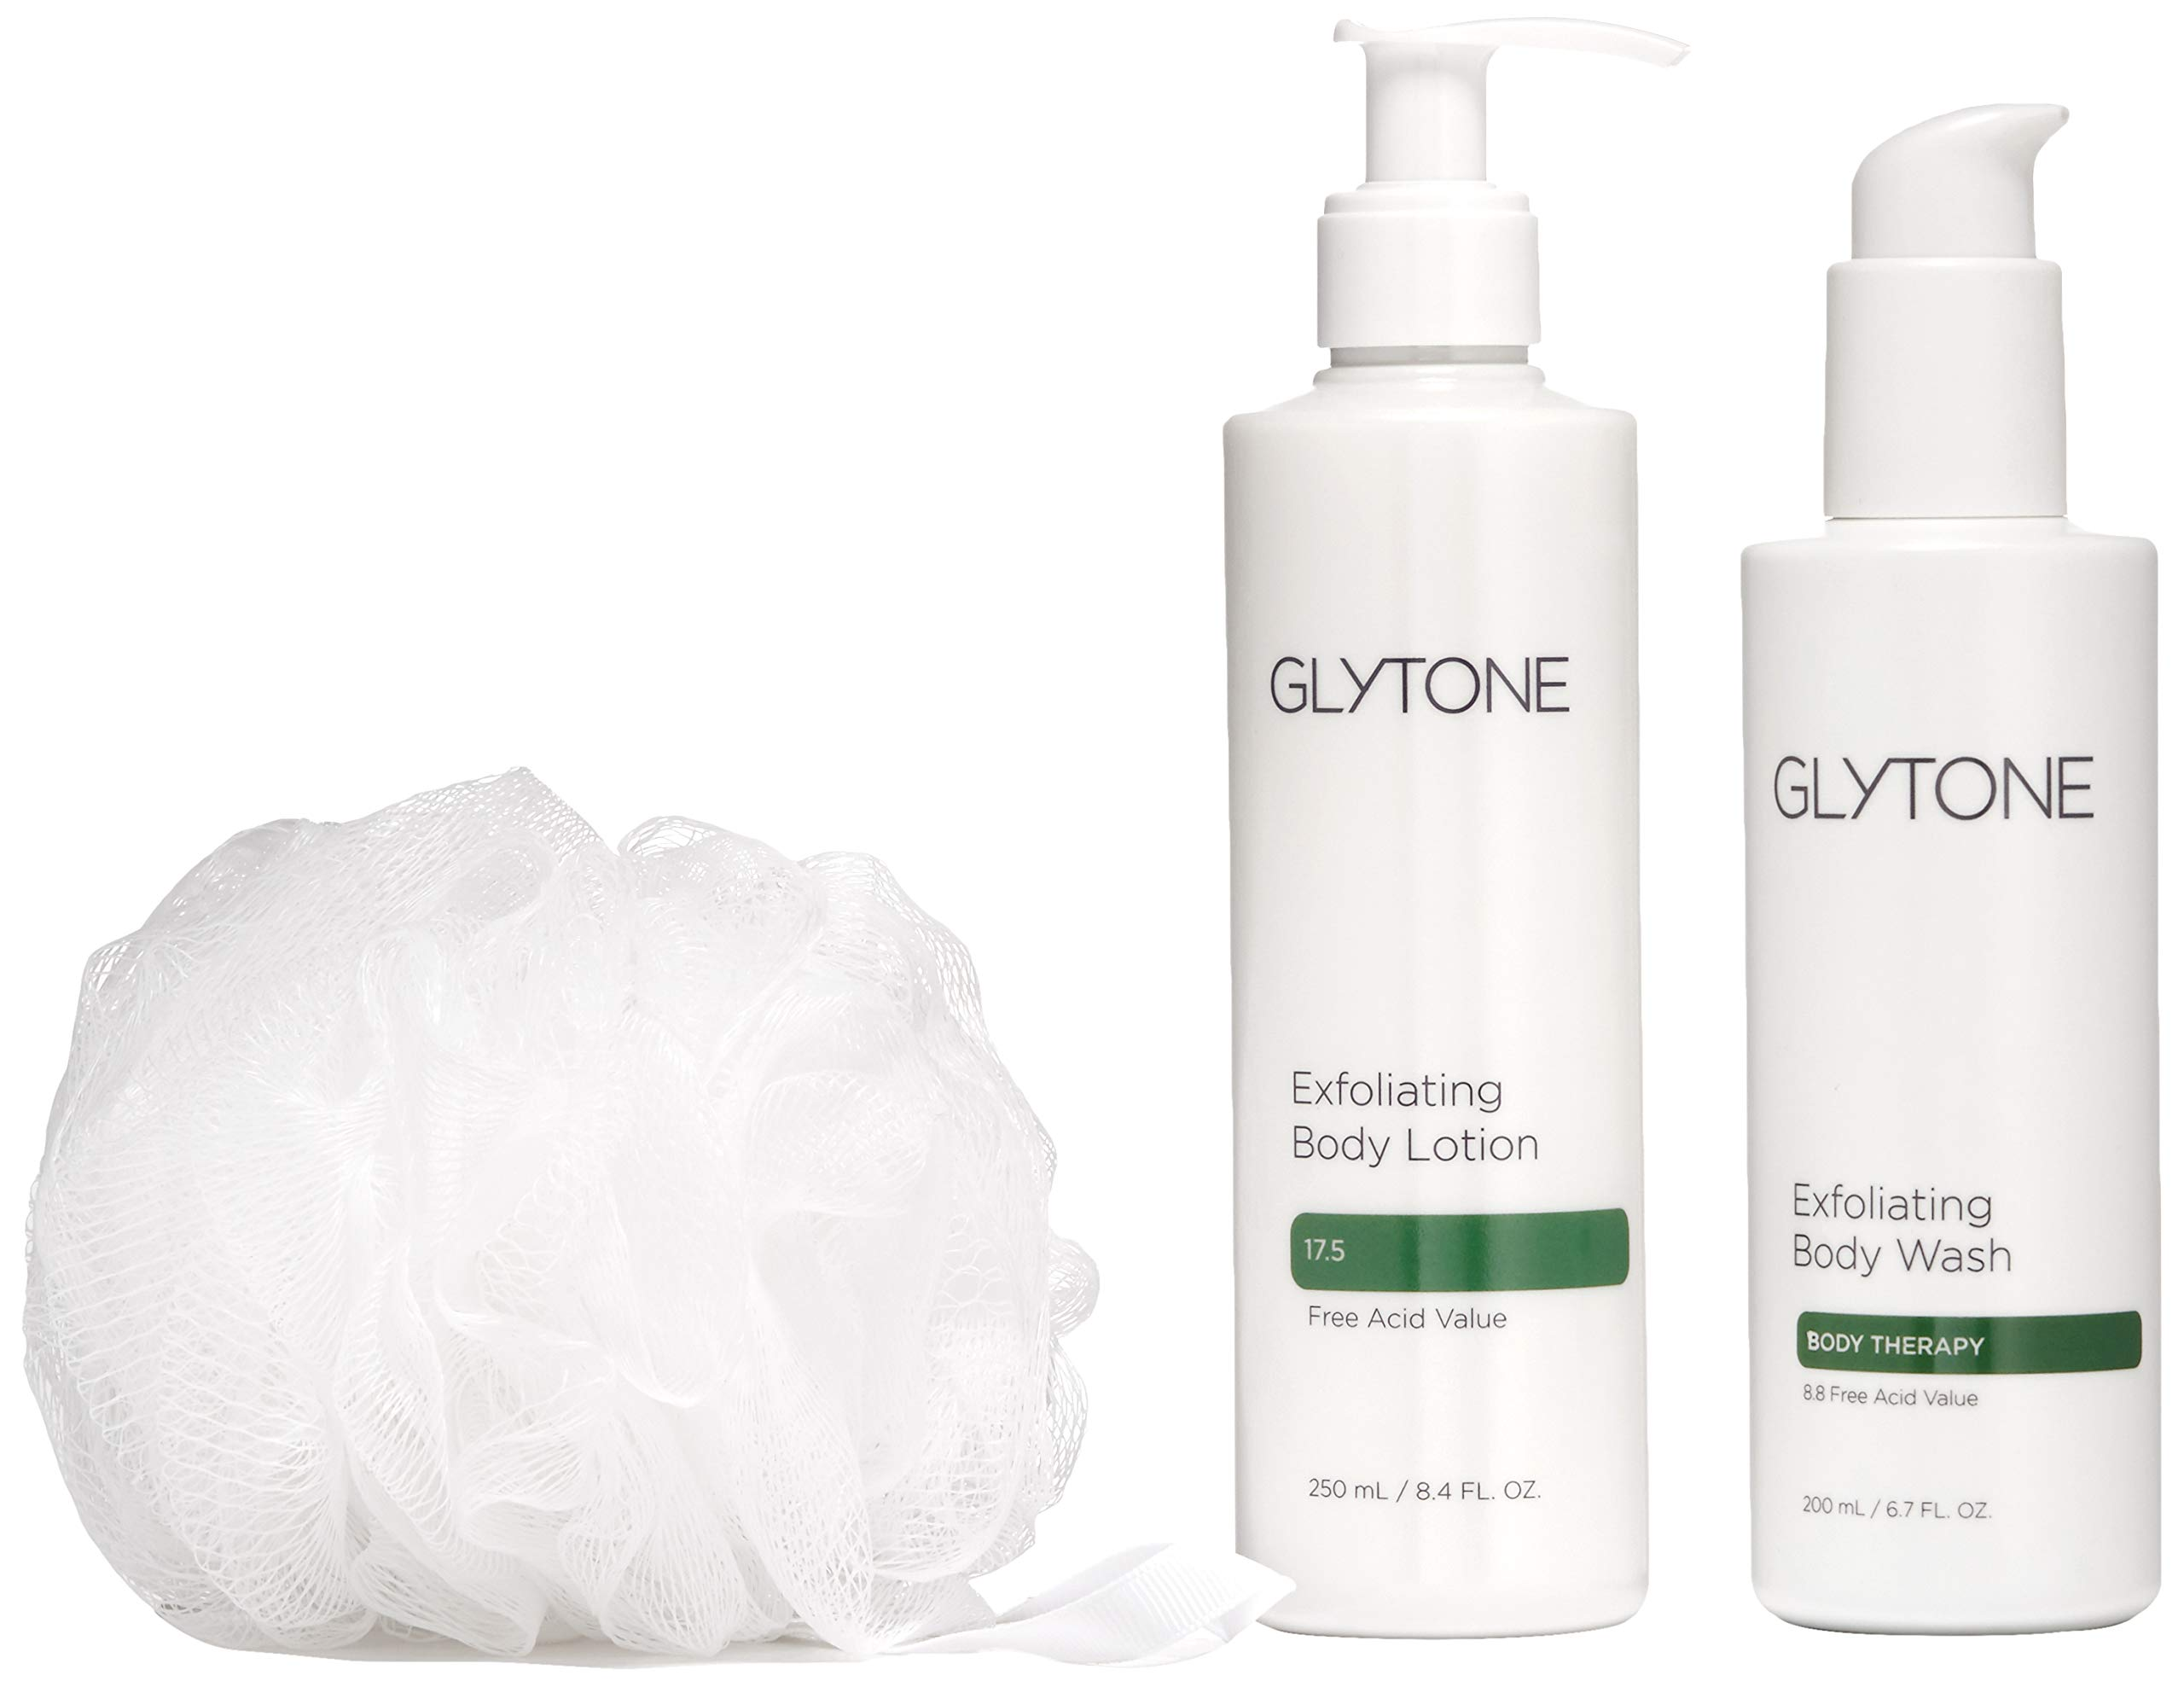 Glytone KP Kit Keratosis Pilaris - Exfoliating Body Wash, Lotion, Shower Pouf, Smooth Rough & Bumpy Skin, Chicken Skin, Fragrance-Free, Kit by GLYTONE